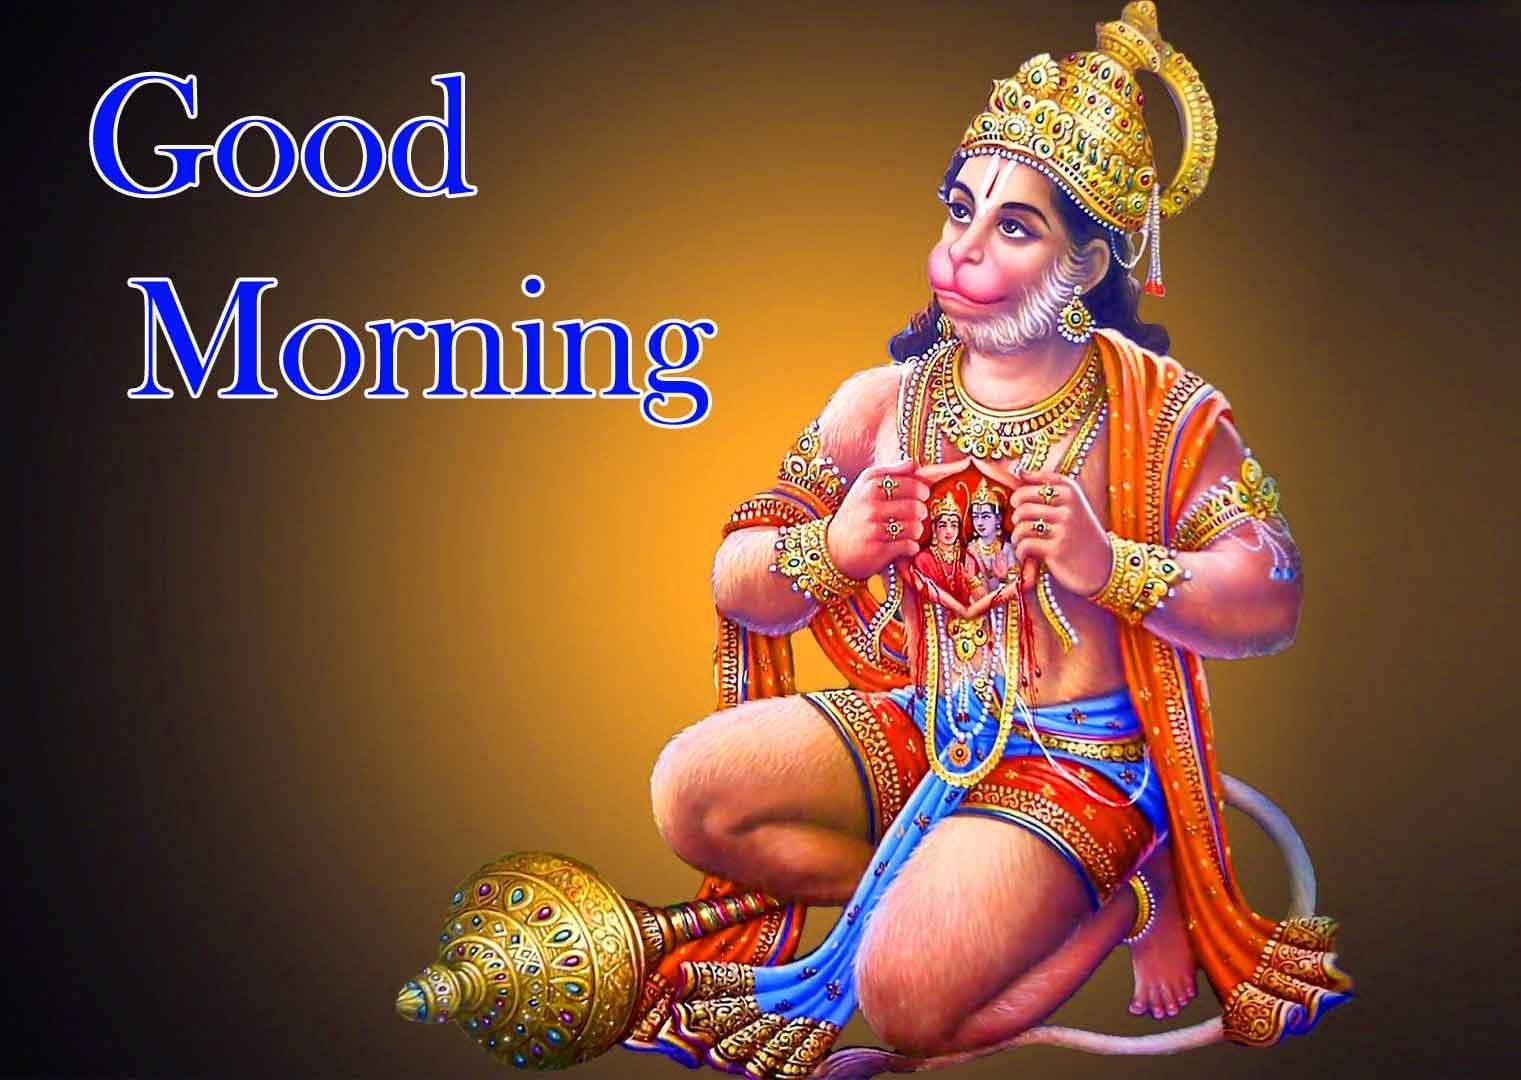 Good Morning Wallpaper Images With Hanuman Ji